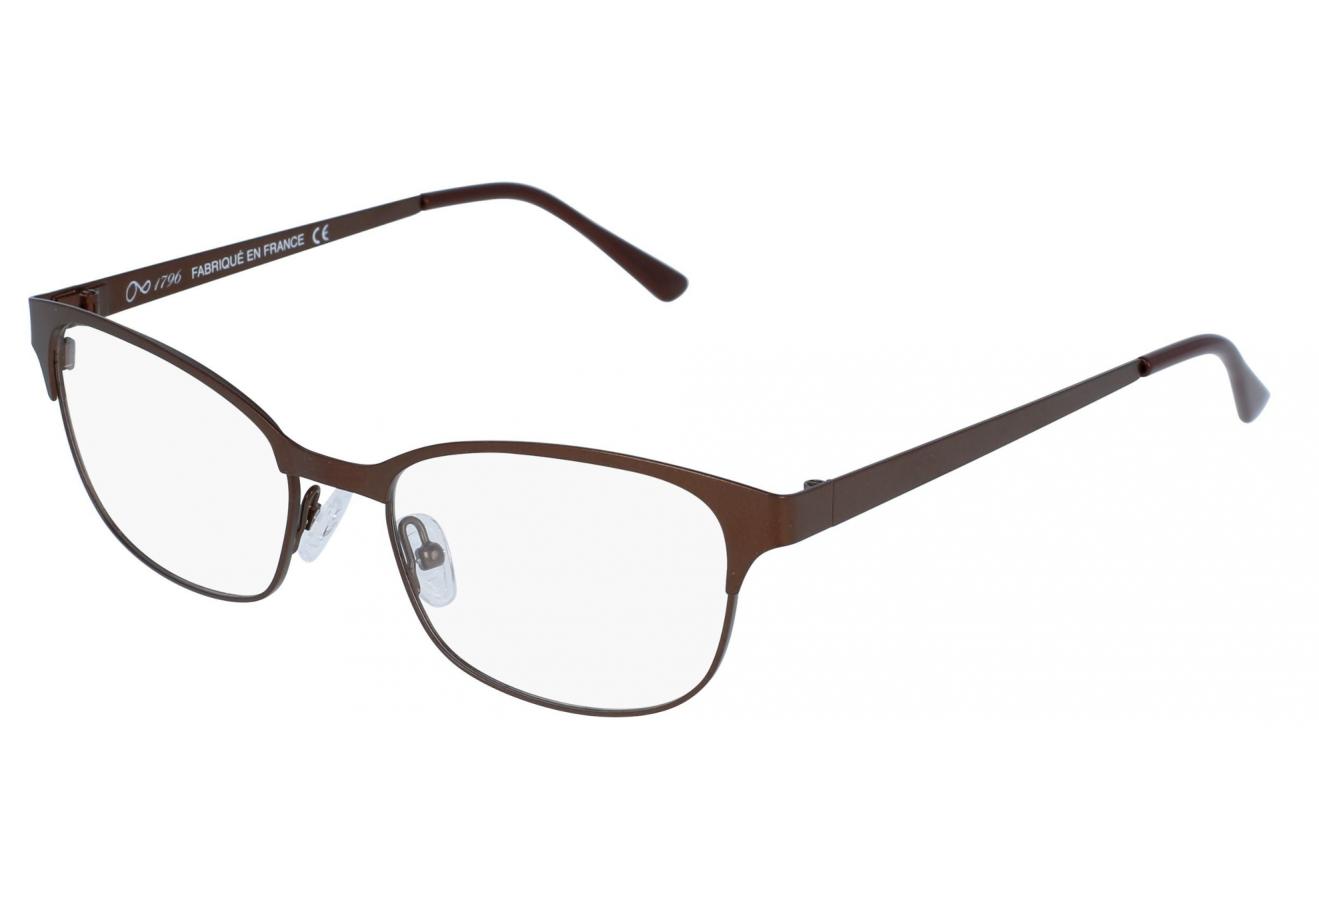 lunettes de vue 1796 cbfm 1703 brun 50 18. Black Bedroom Furniture Sets. Home Design Ideas